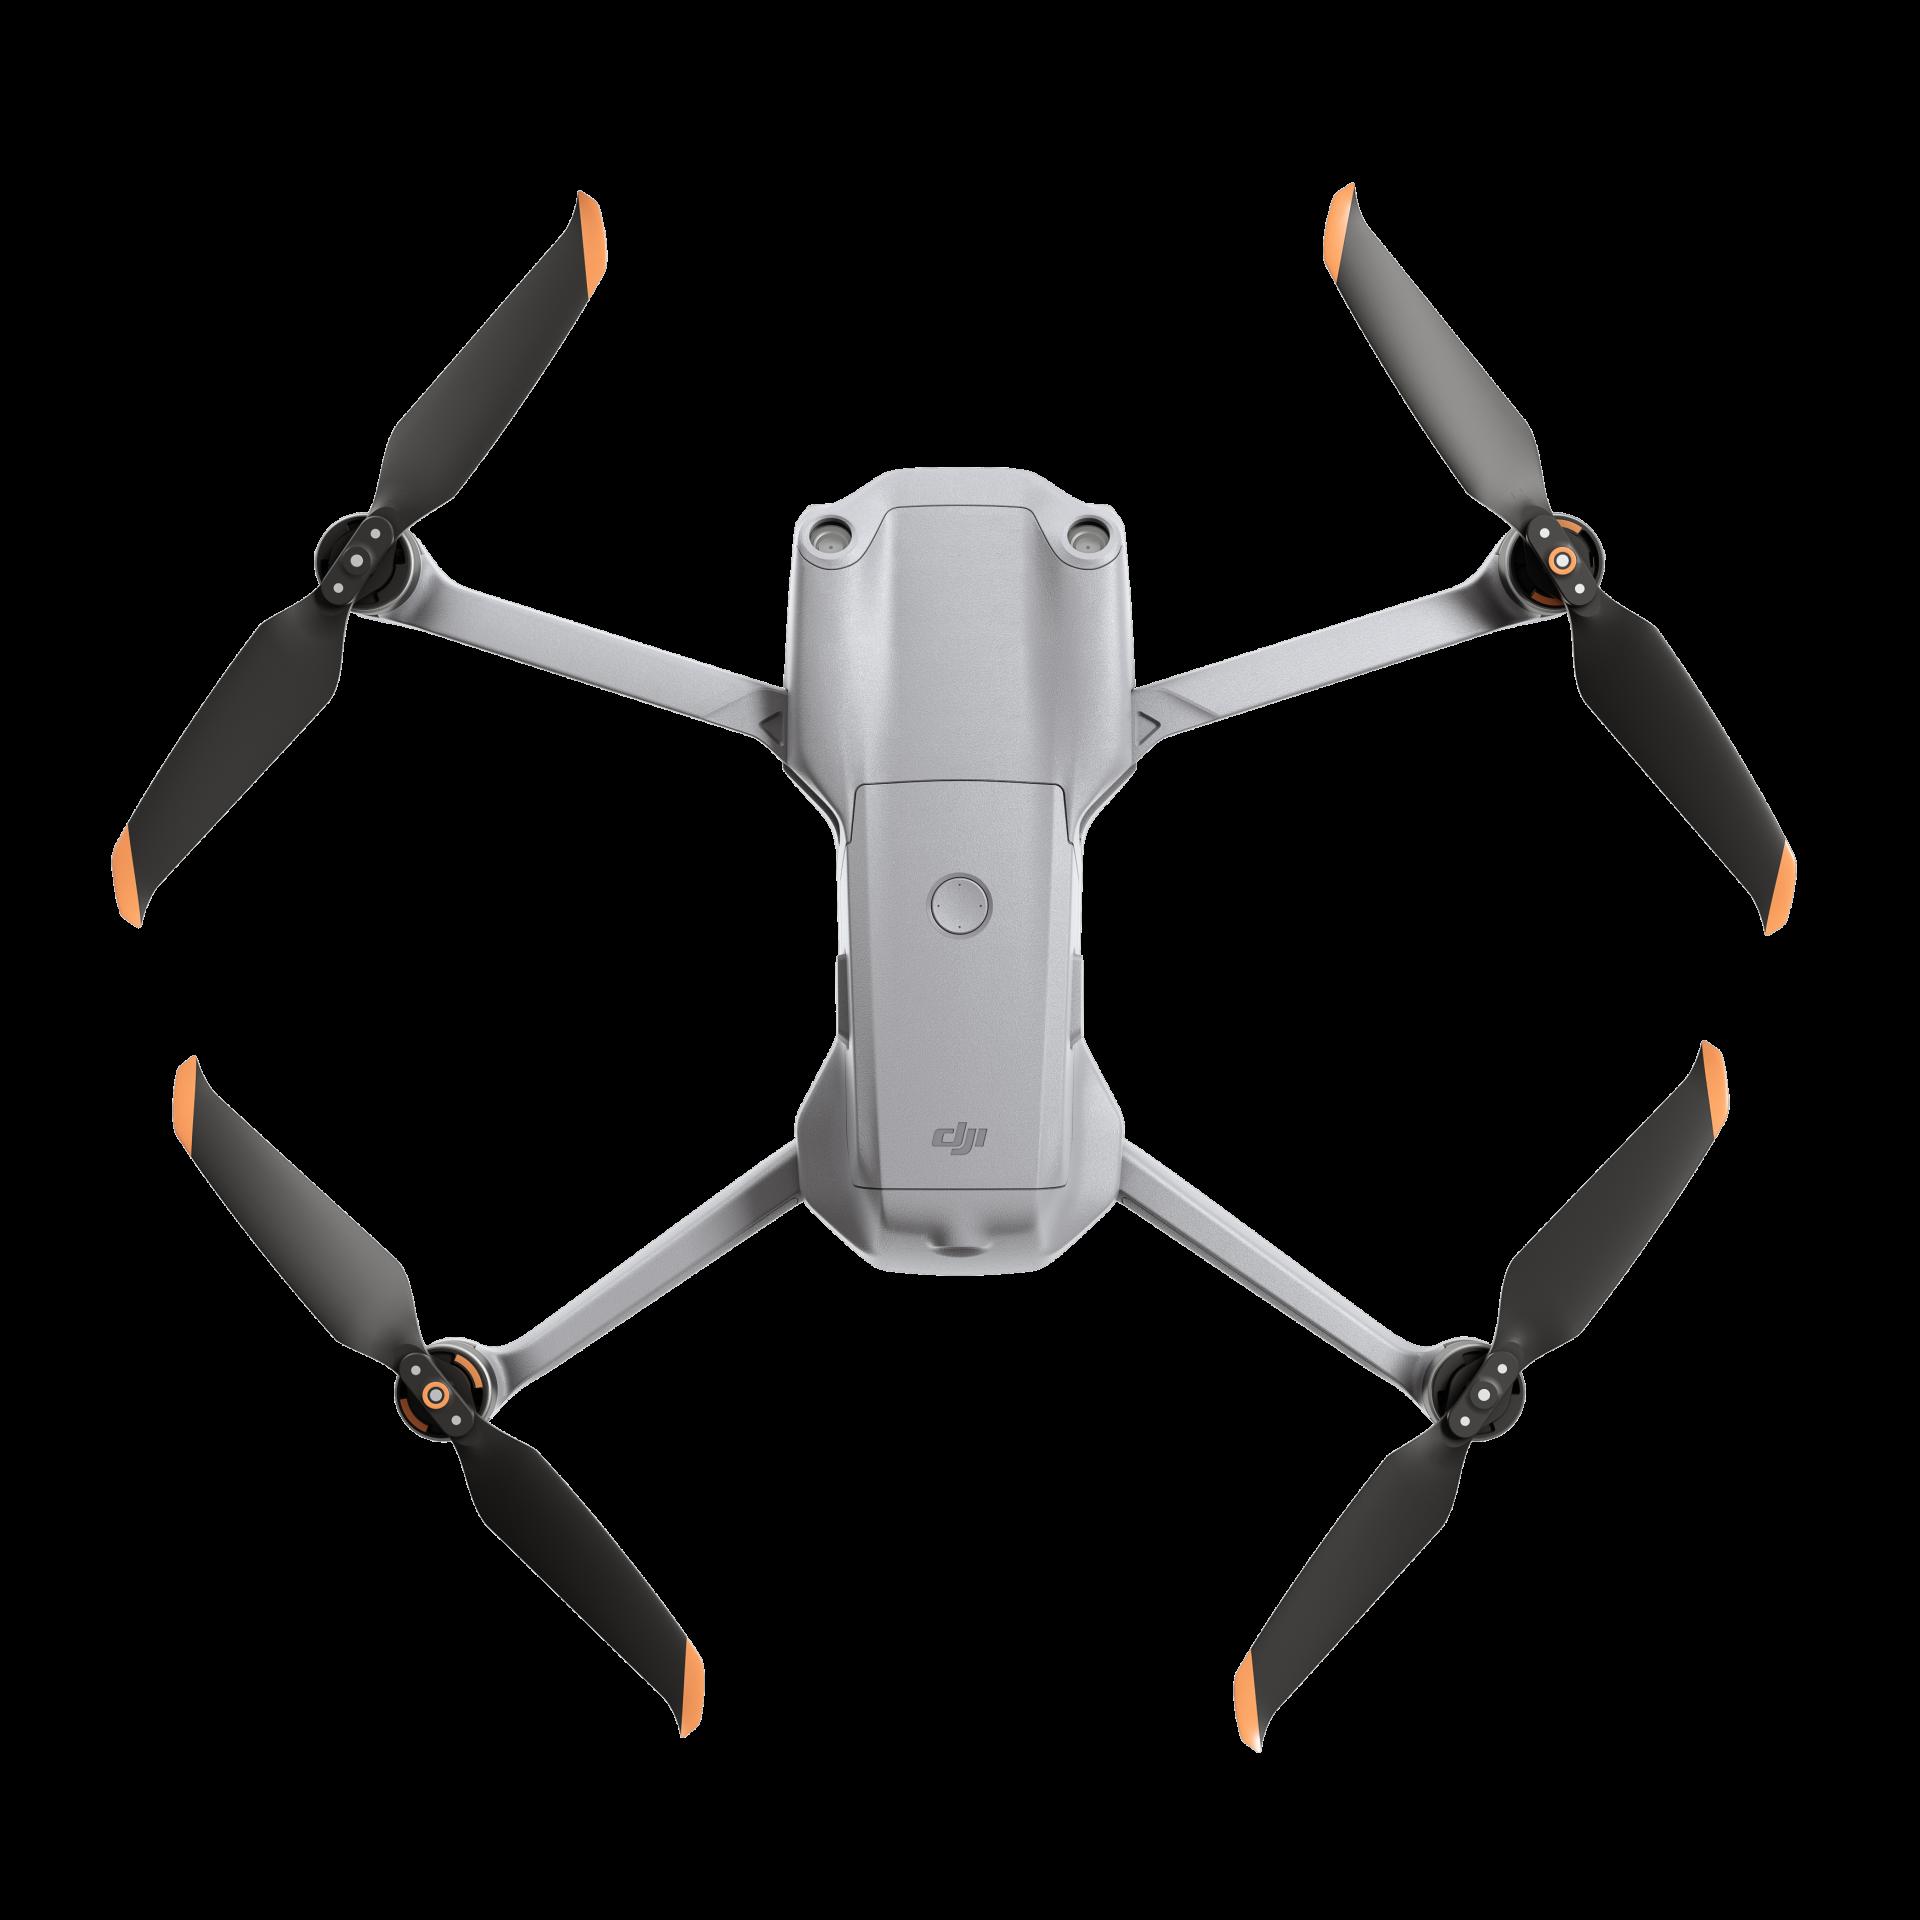 DJI AIR 2S Drone_03